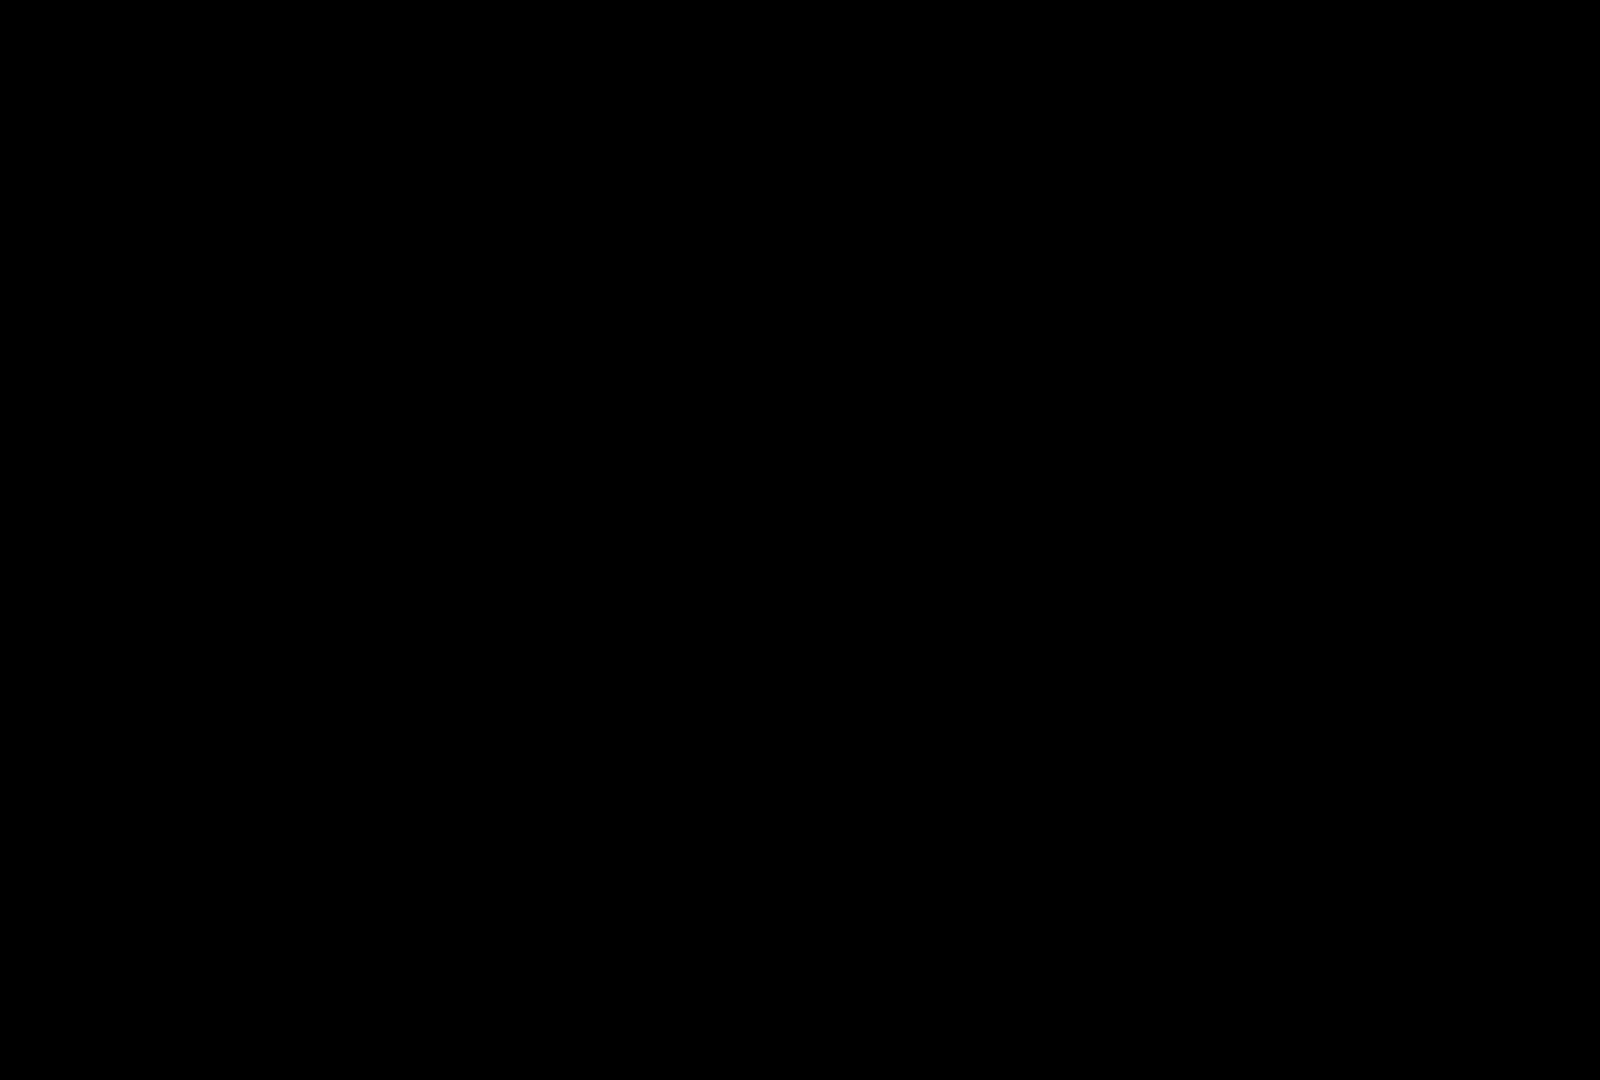 Adidas Herren Kapuzenpulli Laufen Trainieren Essentials Linear Pullover Laufen Kapuzenpulli Grau 6b6ace